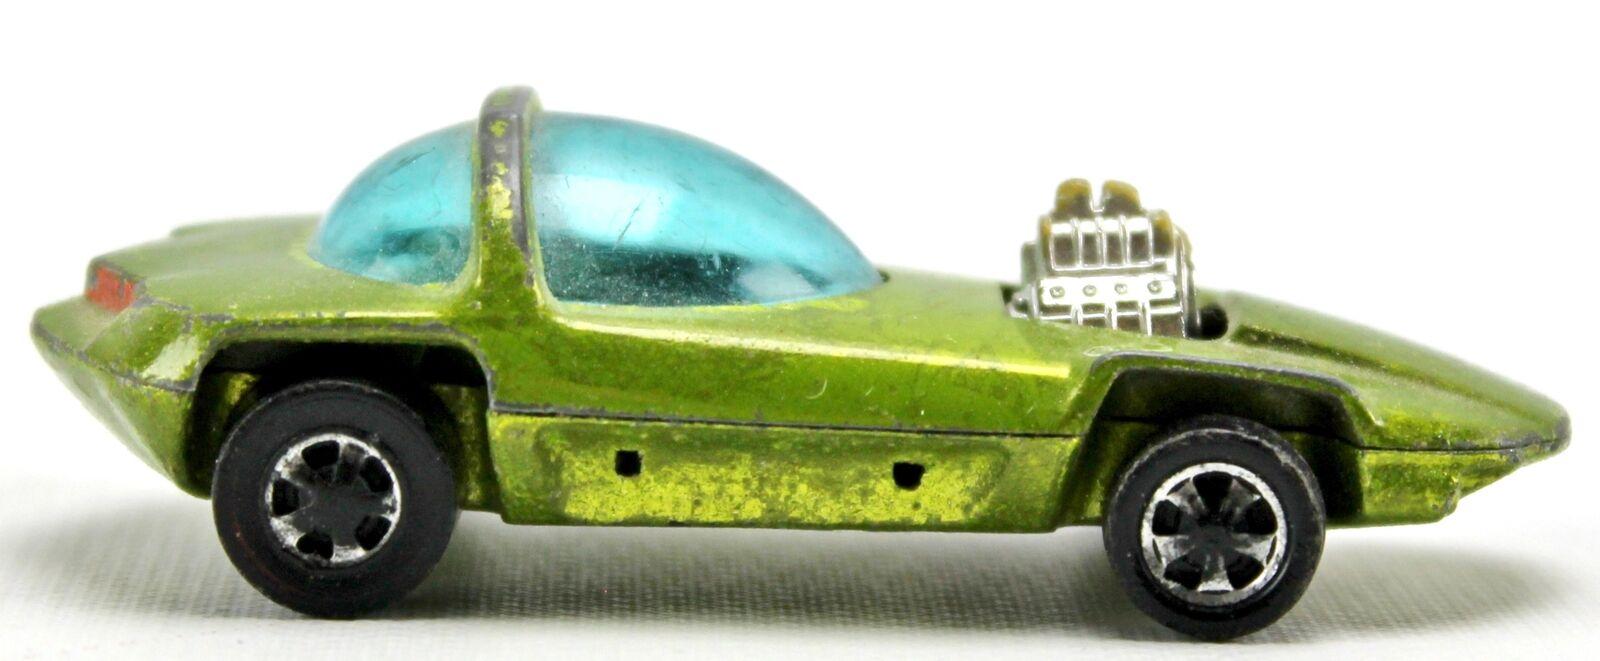 1967 Silhouette Lime Grün Antifreeze rotline Hot Wheels Hong Kong 1 64